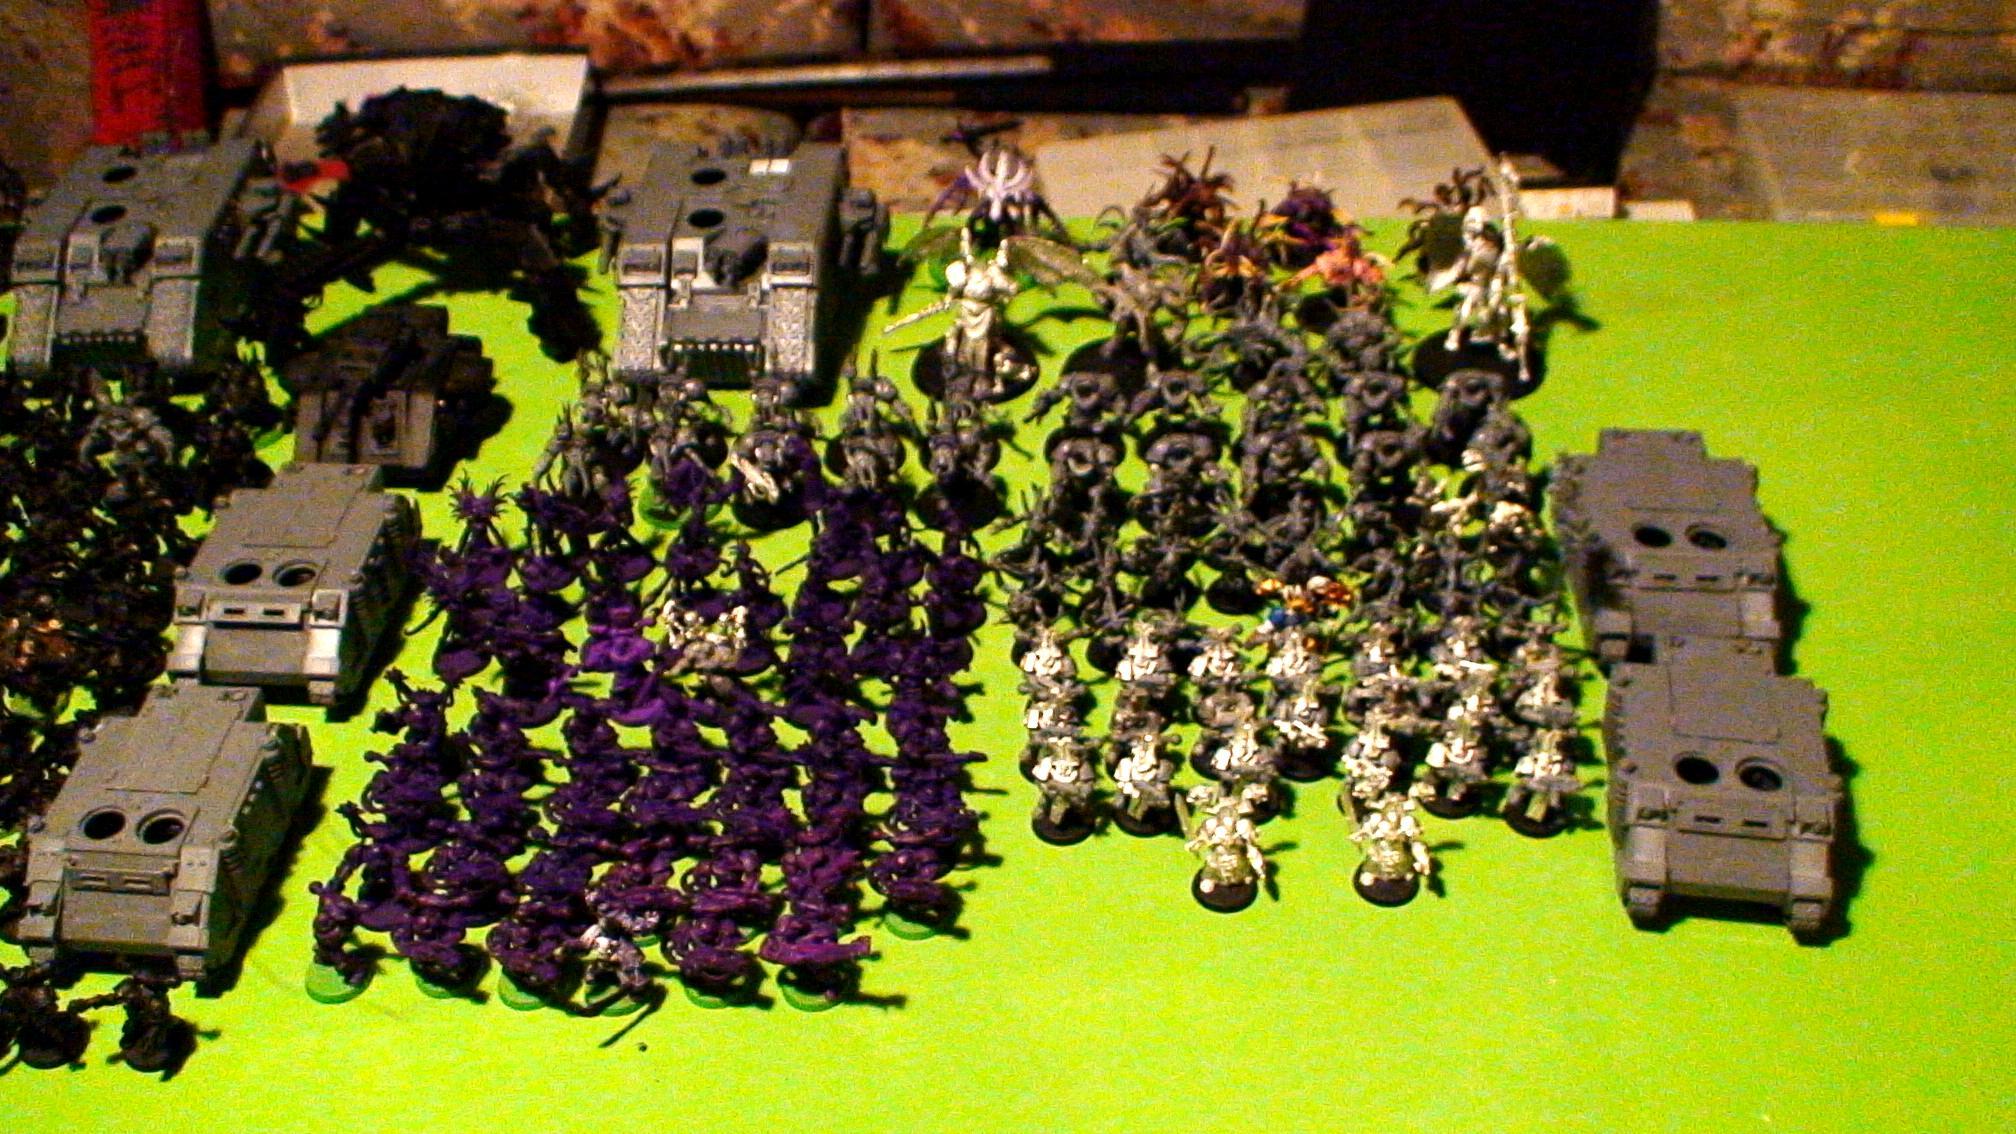 Berserkers, Black Legion, Chaos, Daeomons, Plaugue Marines, Slaanesh, Tzeench, Warhammer 40,000